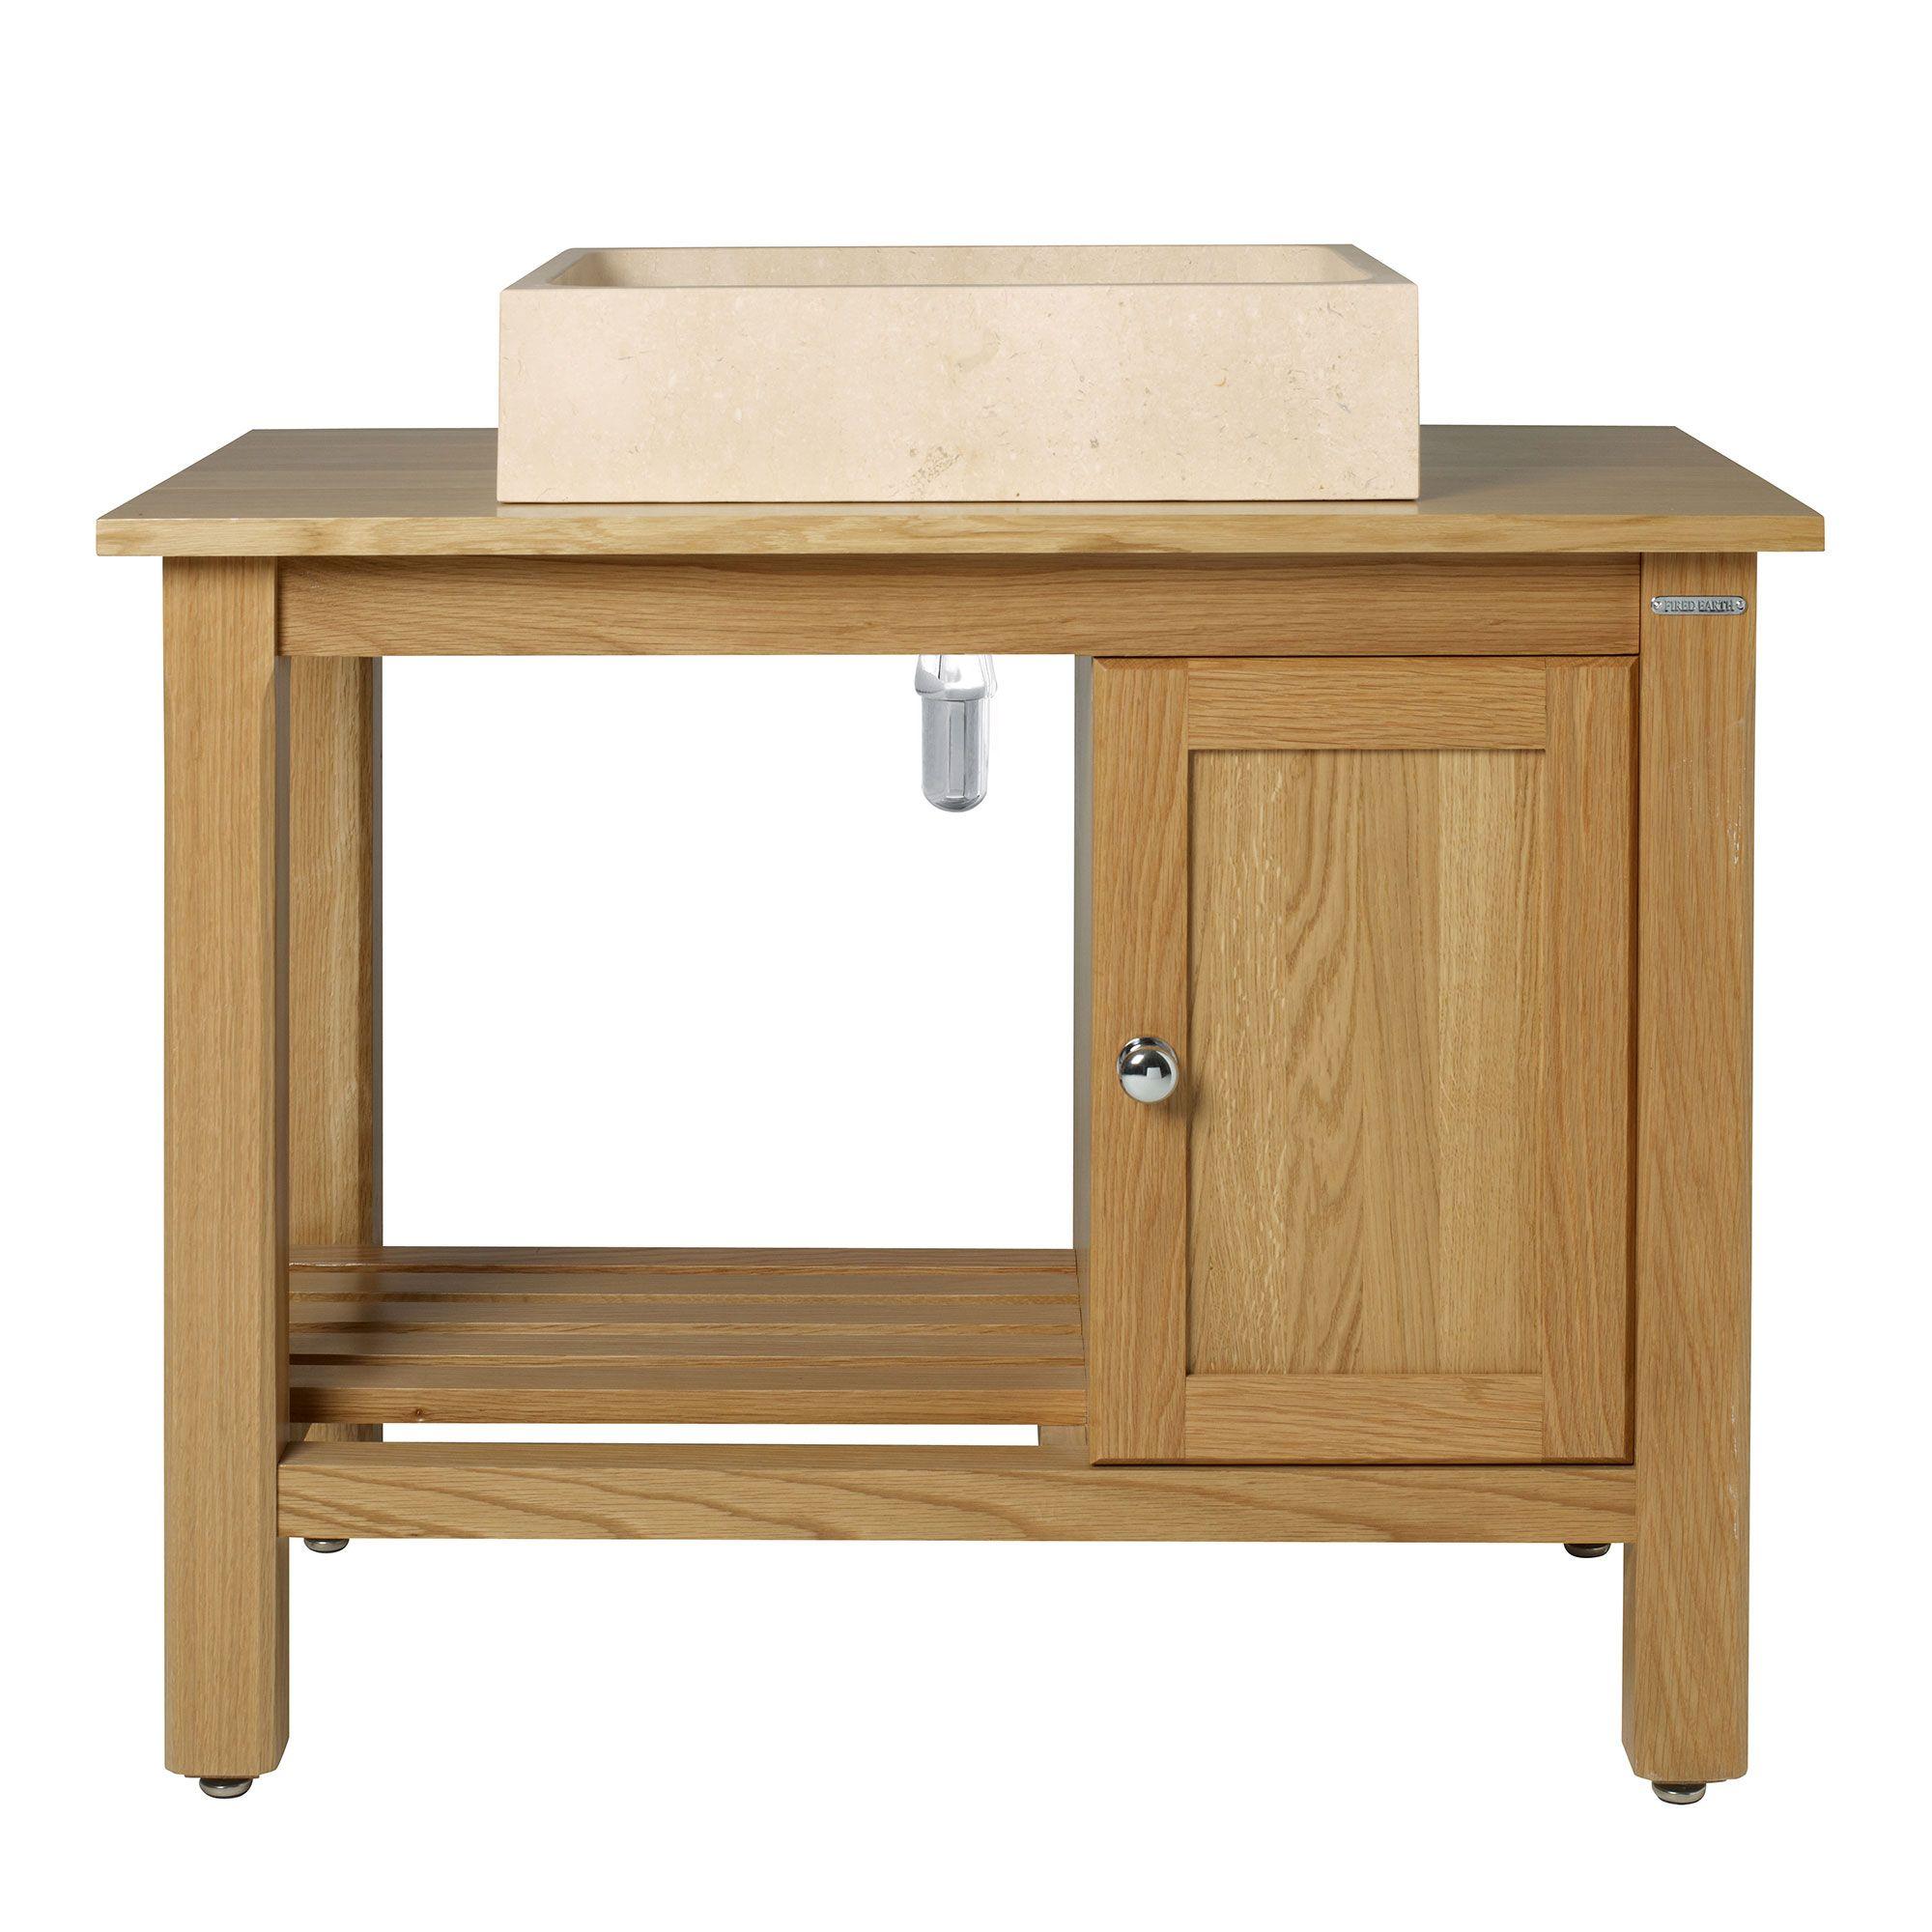 Logic Washstand 900 With Cupboard